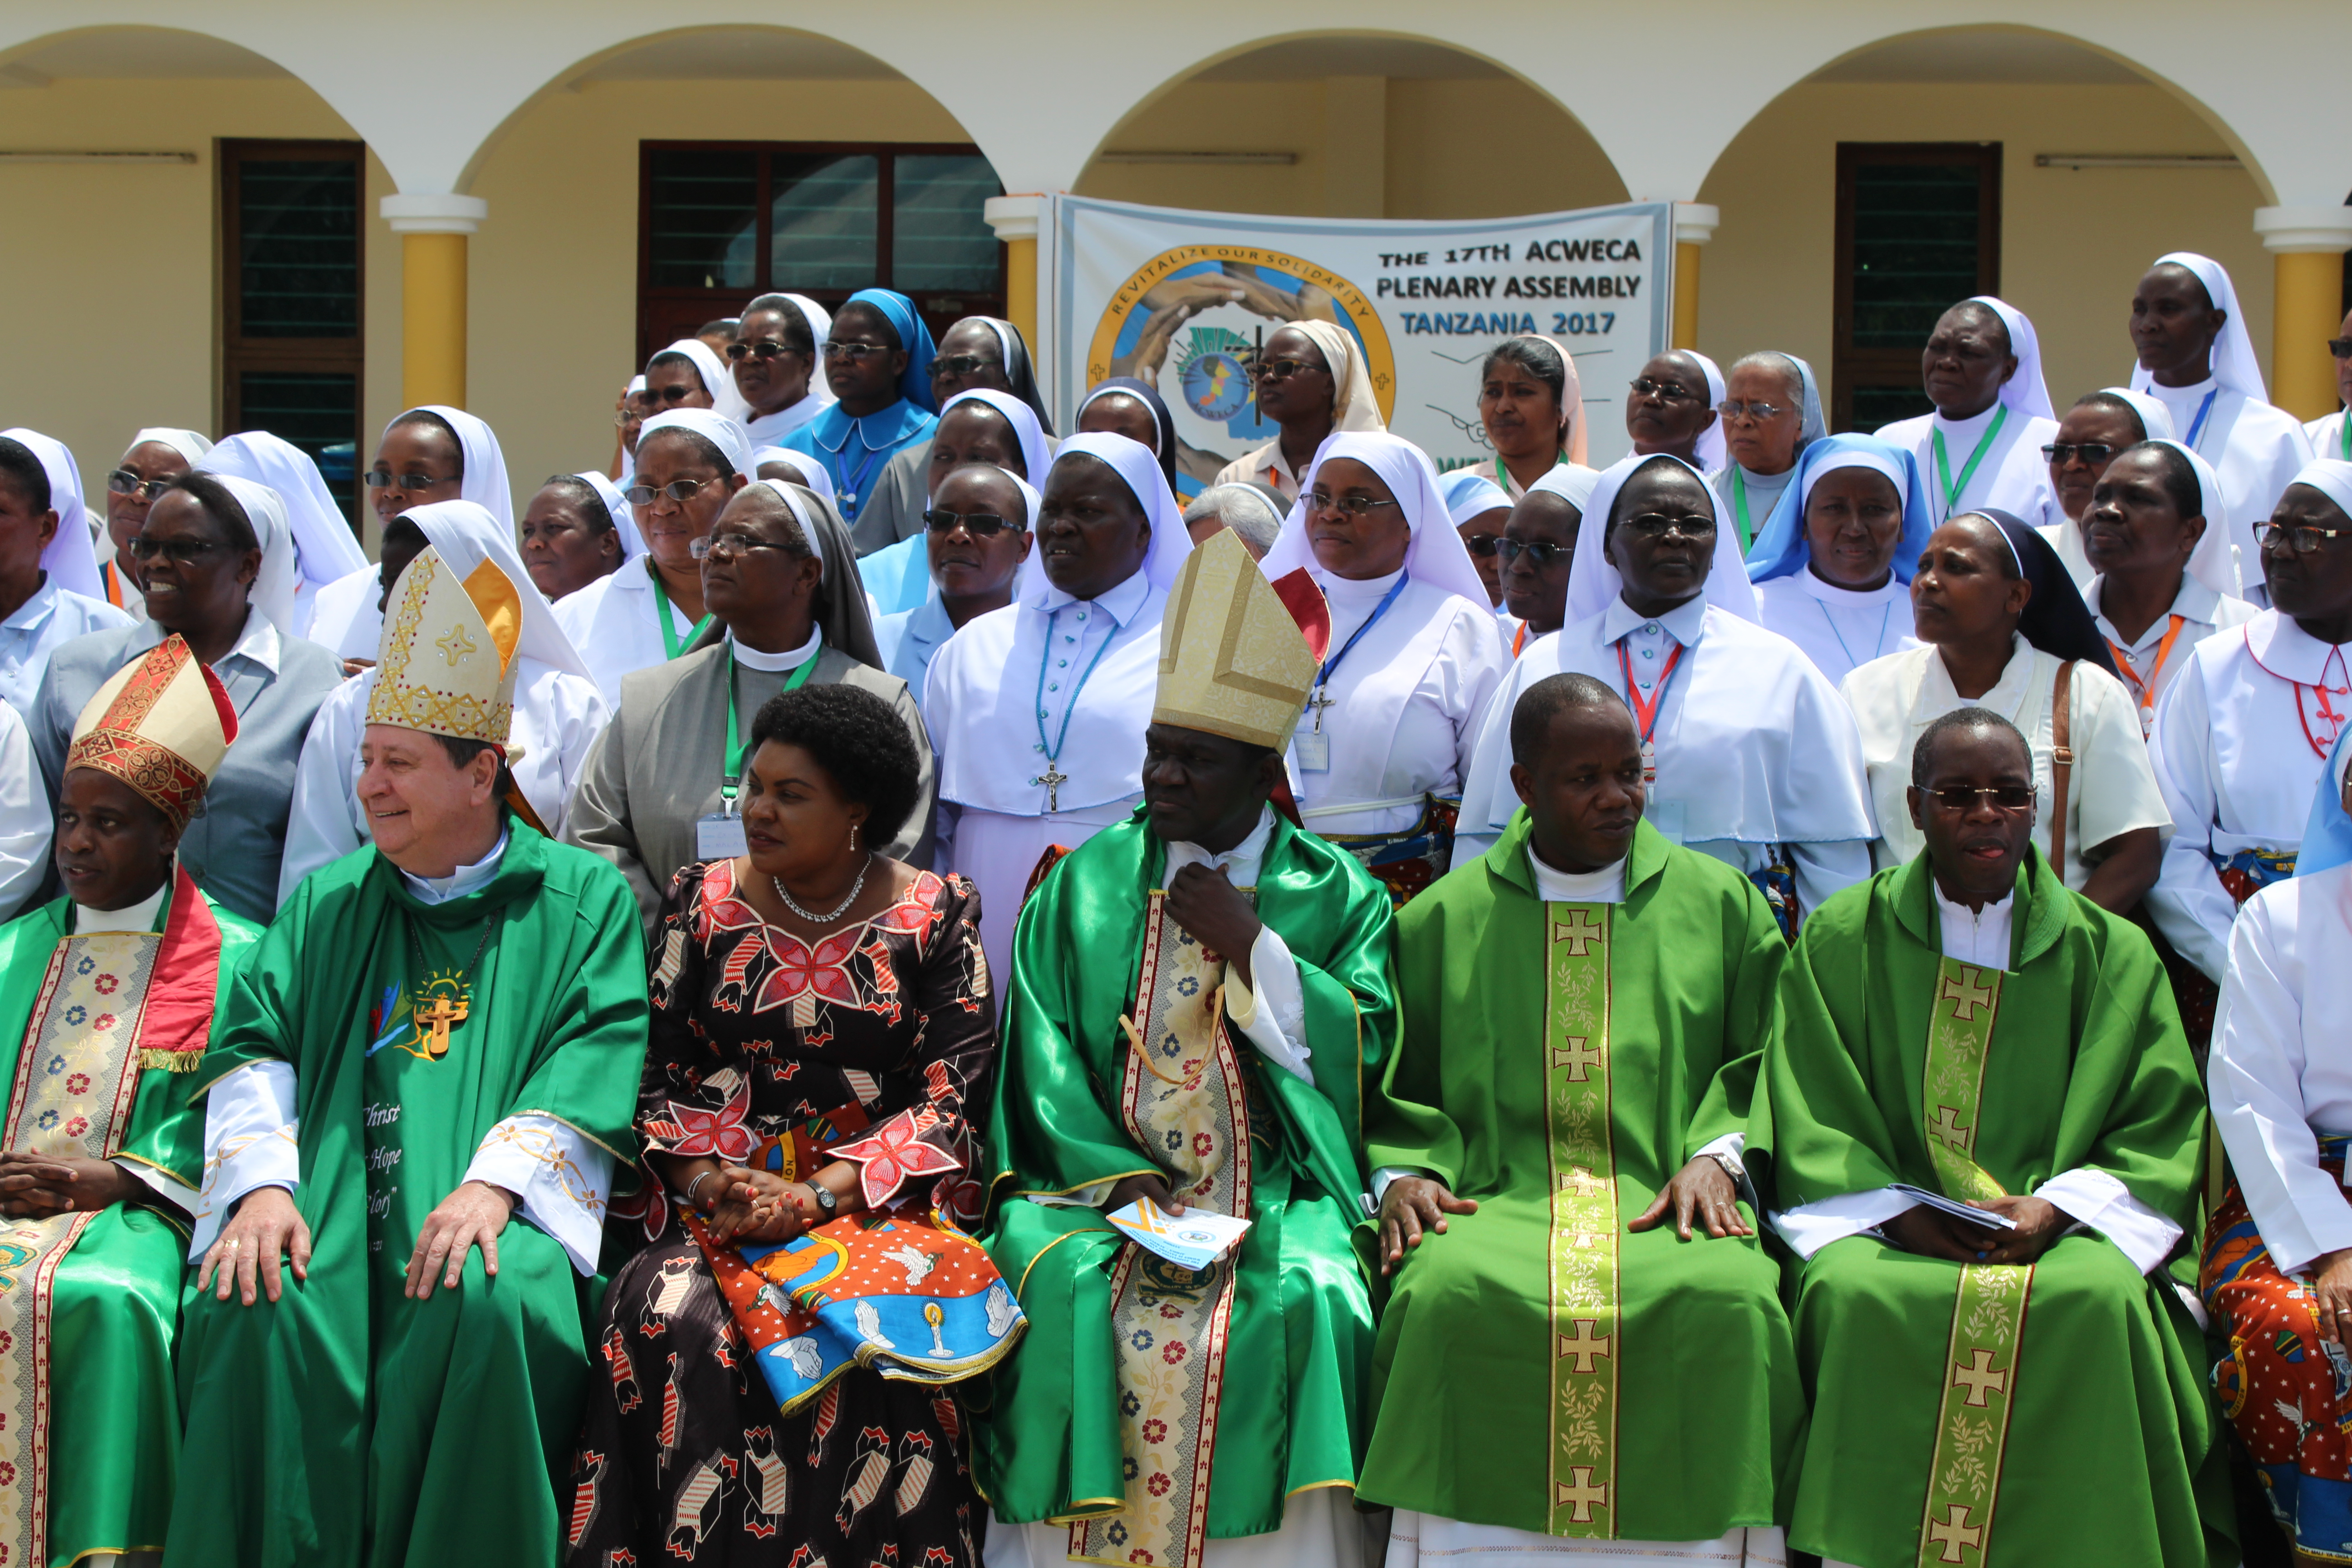 Group photo during ACWECA Plenary Assembly in Dar es Salaam, Tanzania.